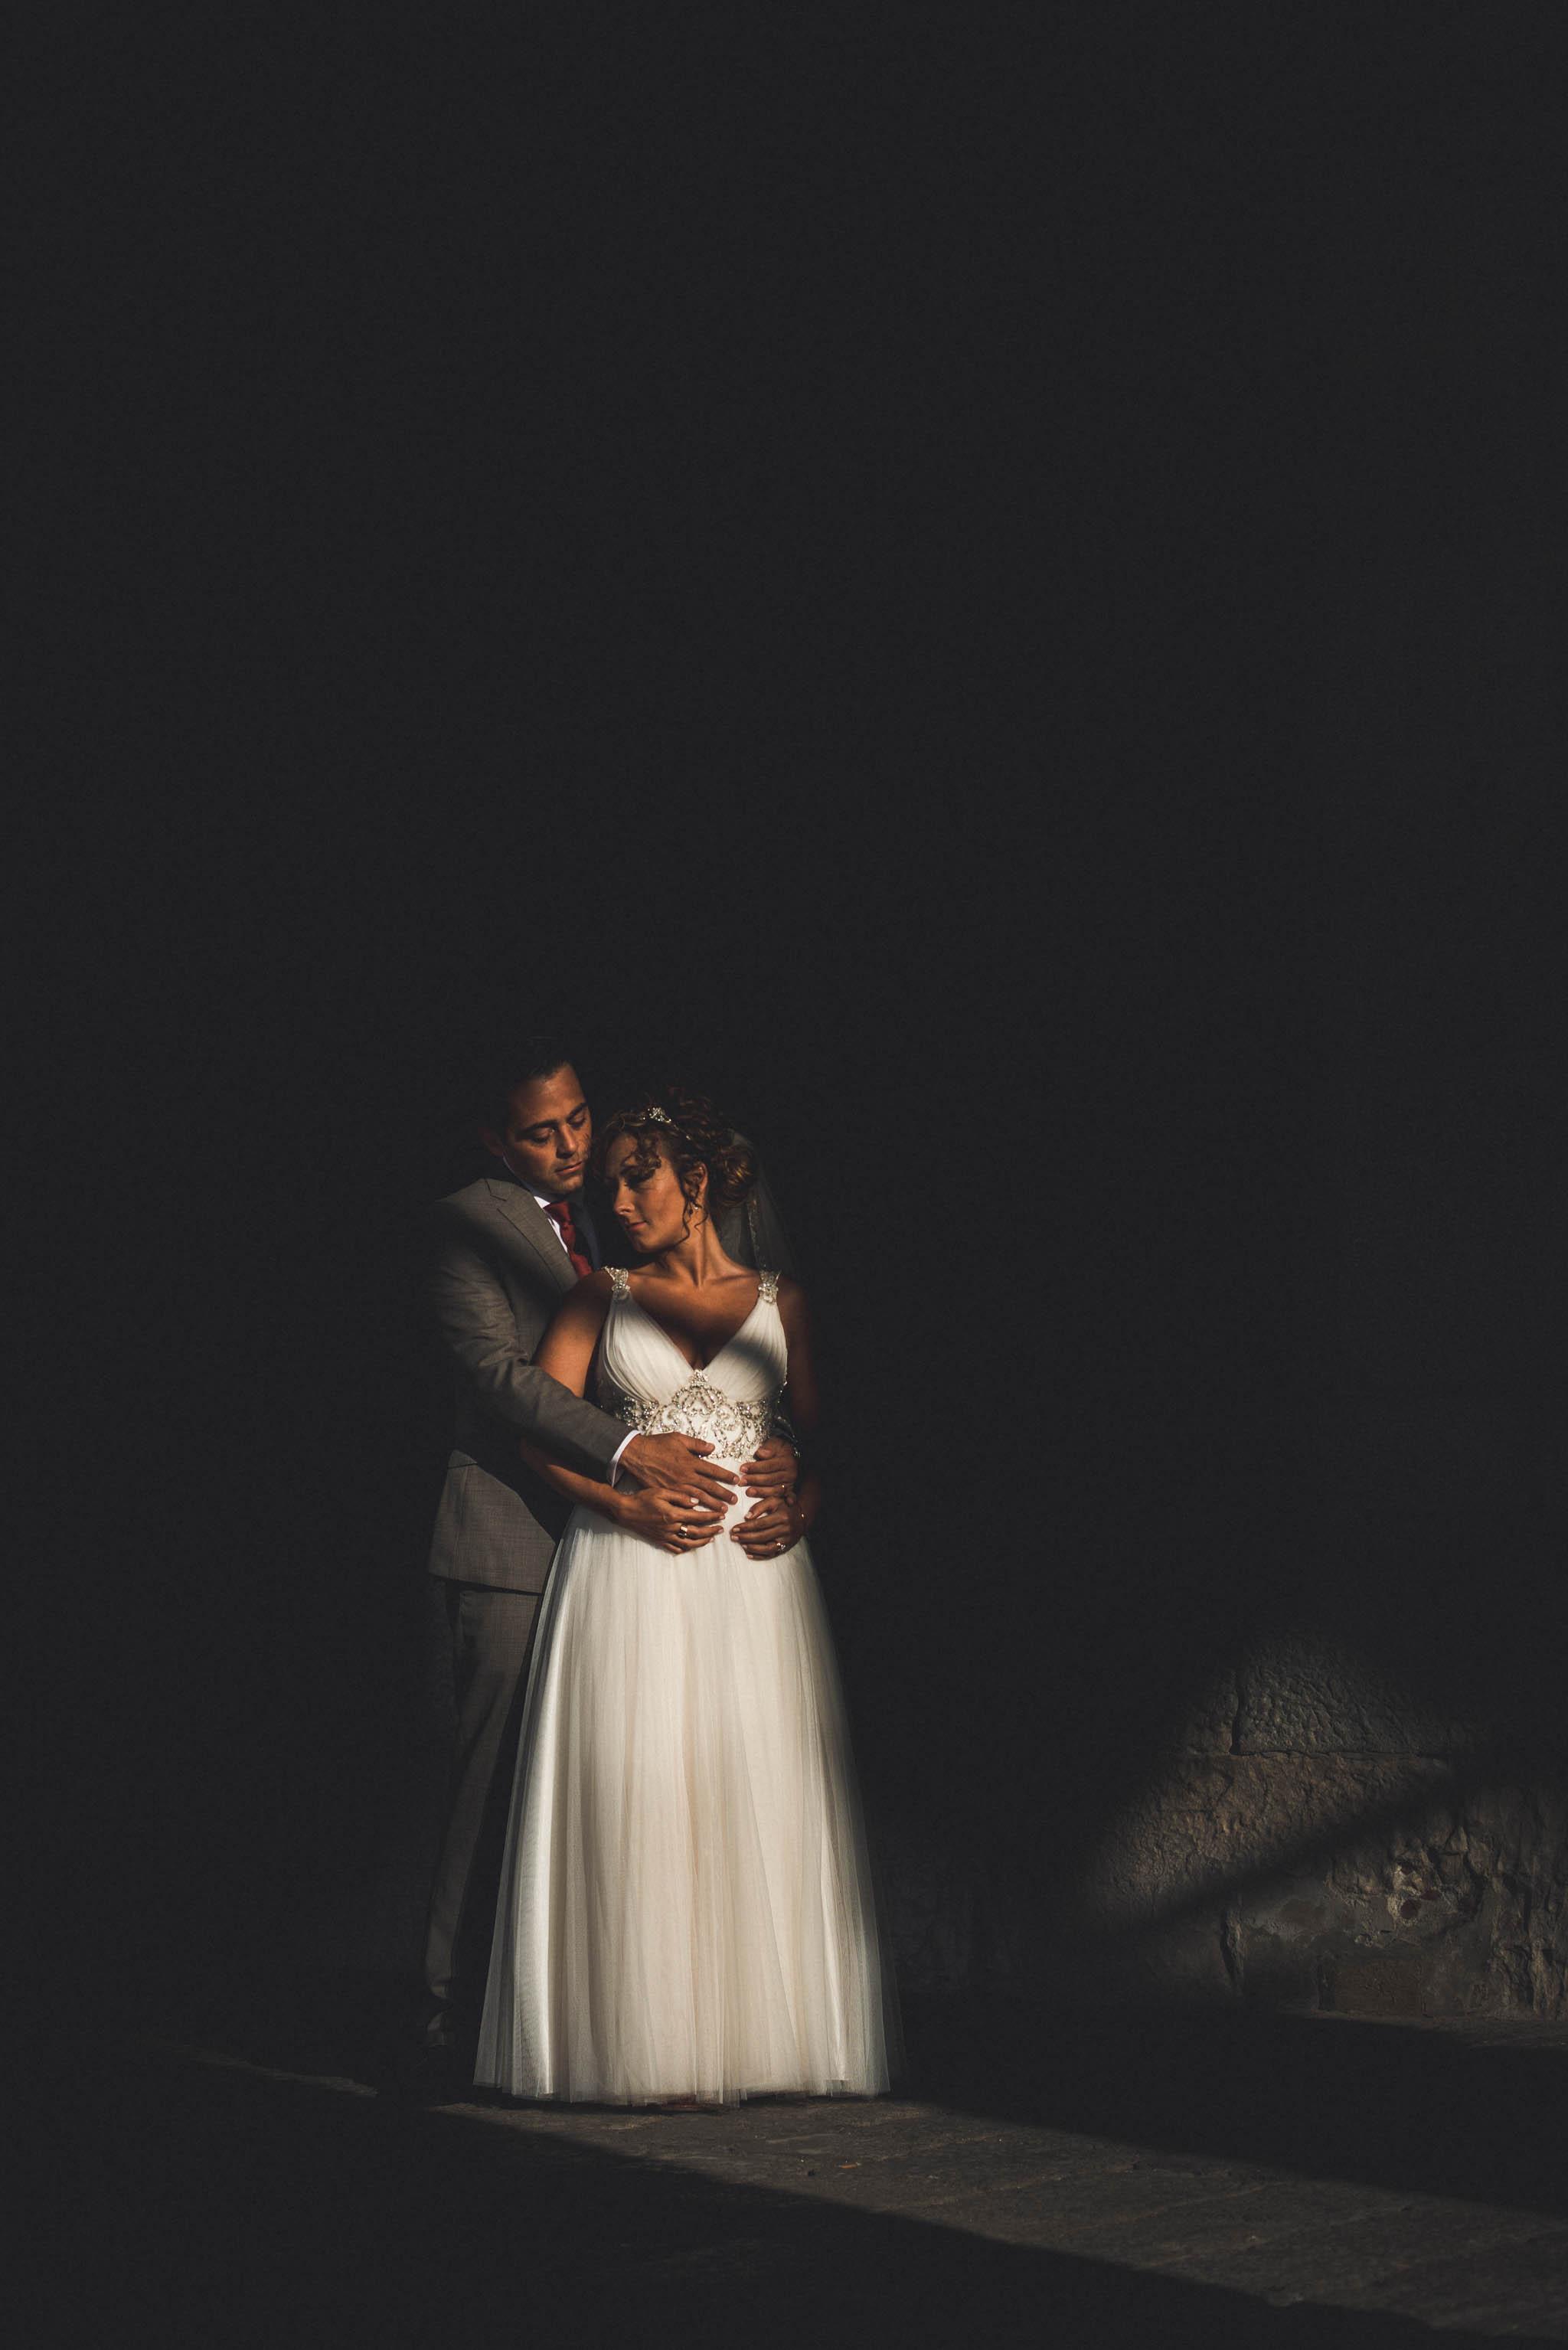 wedding-in-venice-roberto-panciatici-photography-15